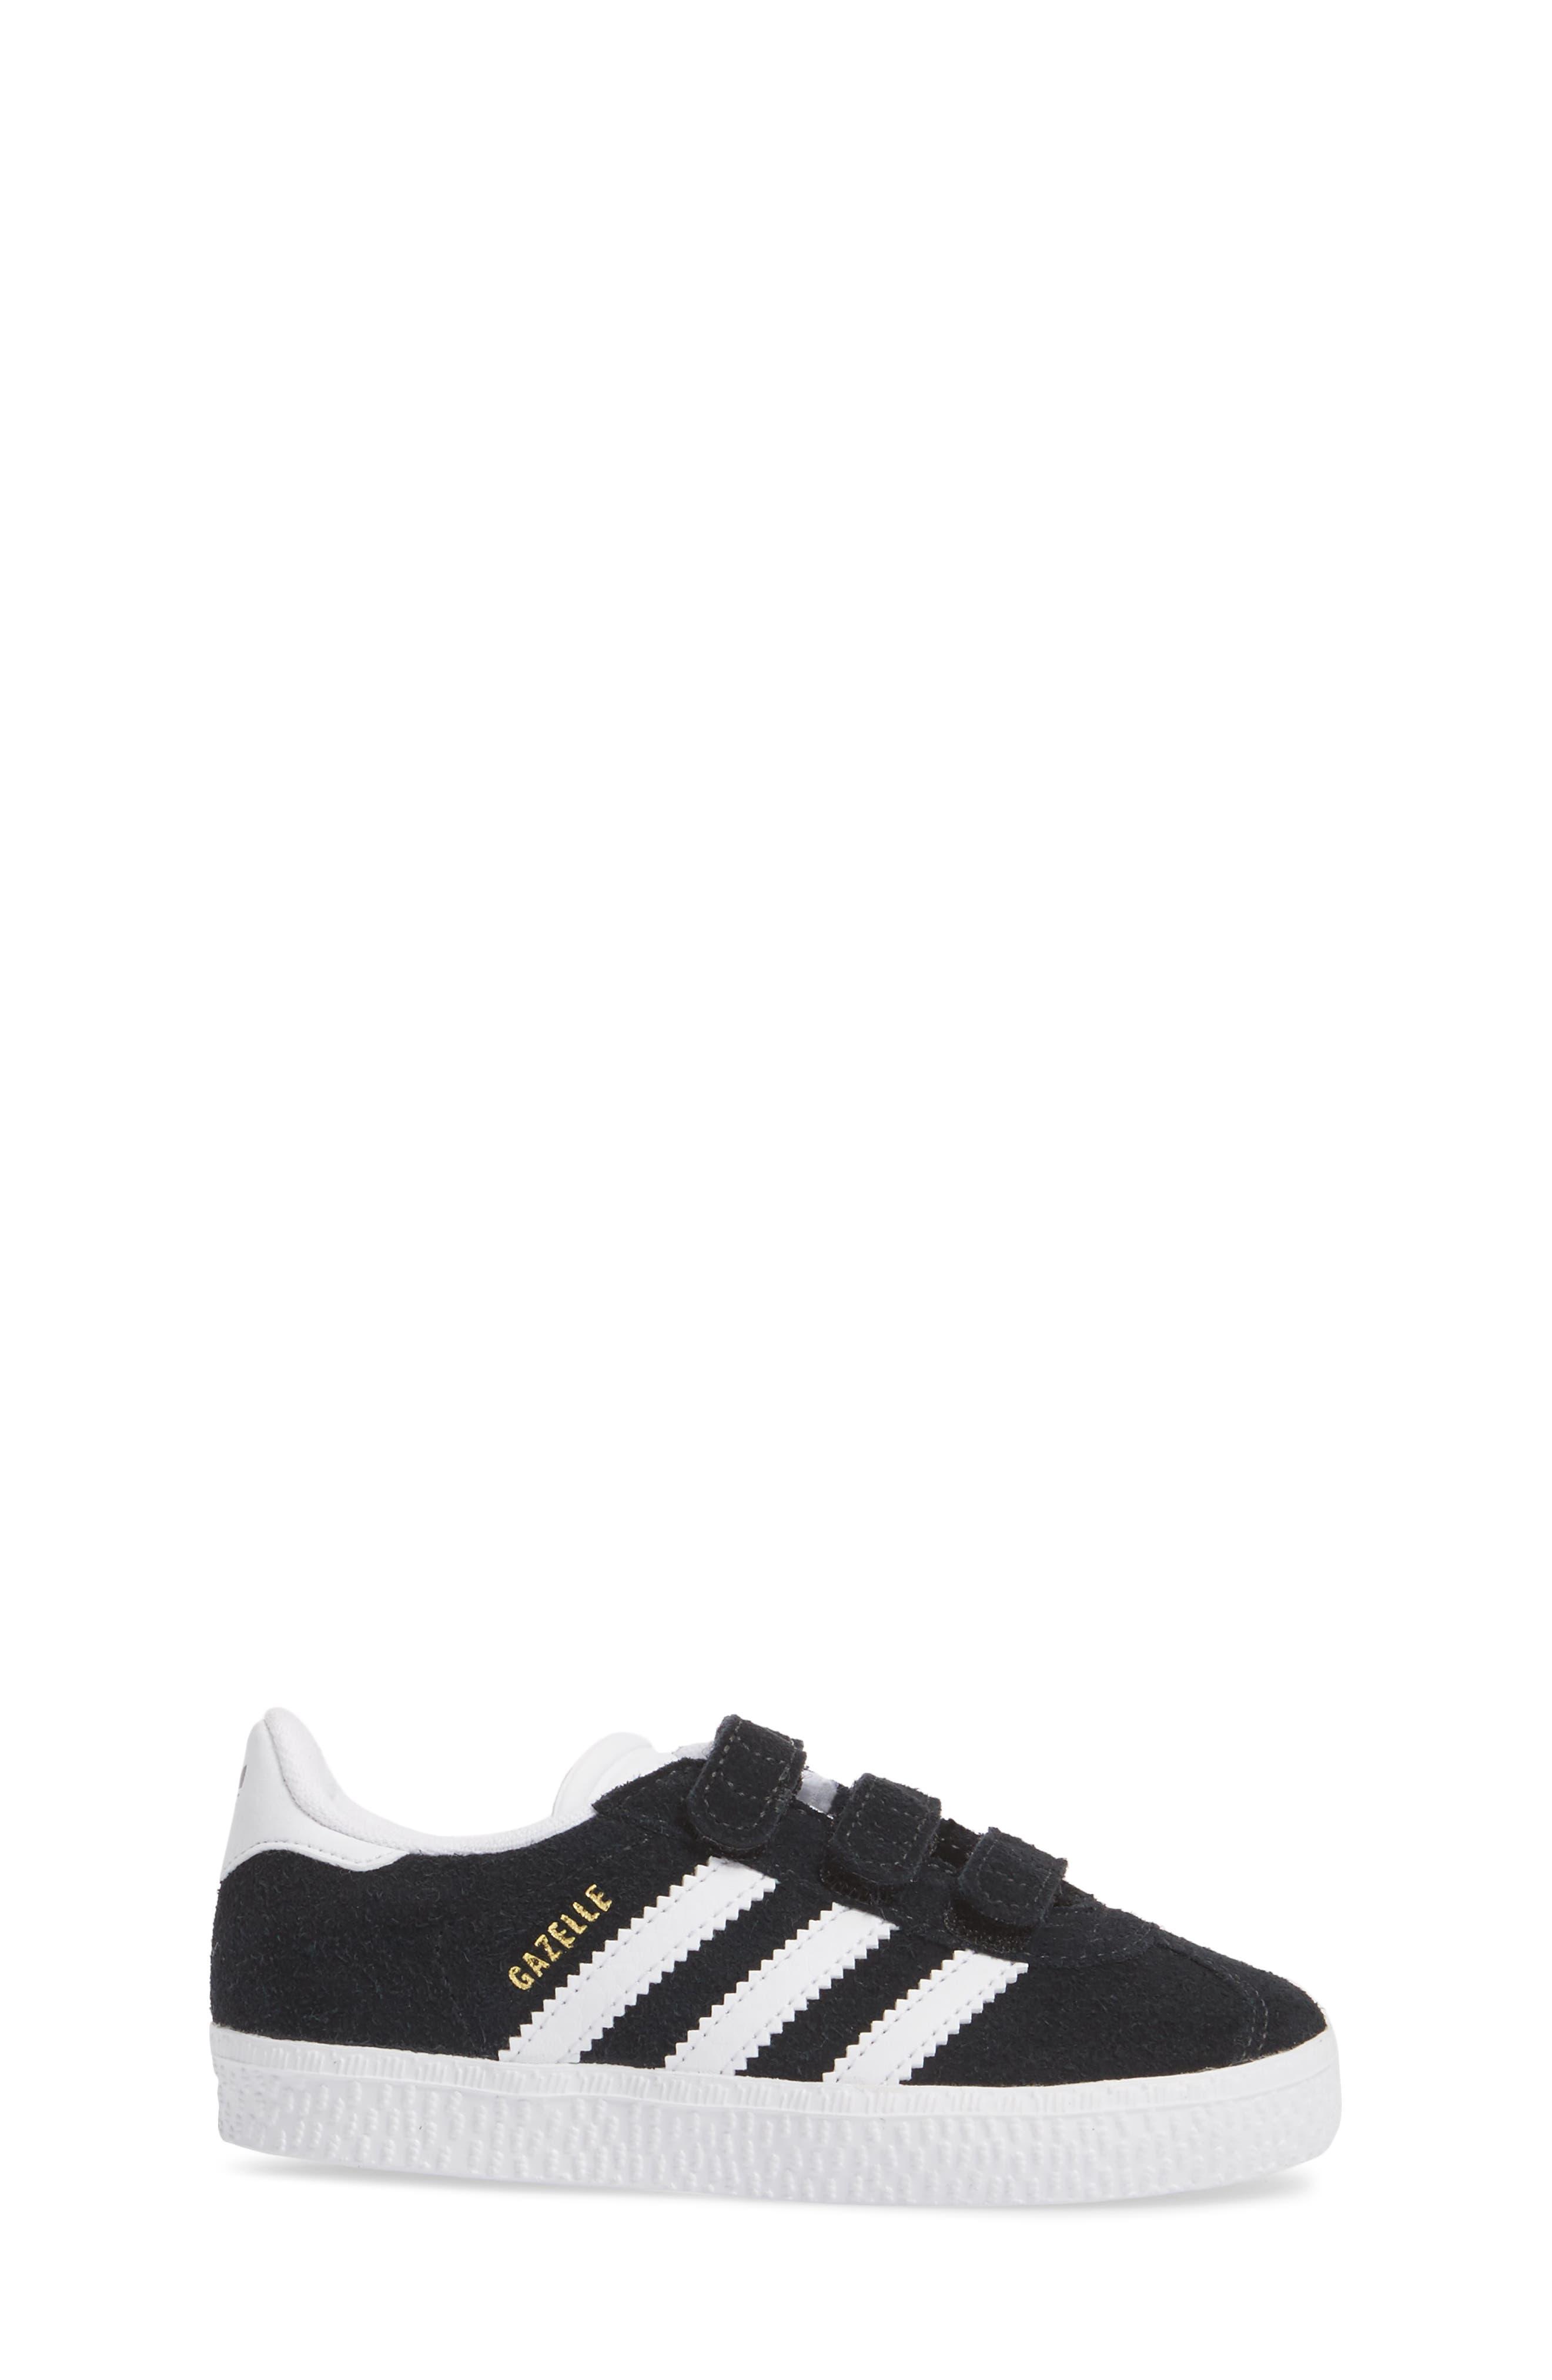 Gazelle Sneaker,                             Alternate thumbnail 4, color,                             Core Black / White / White